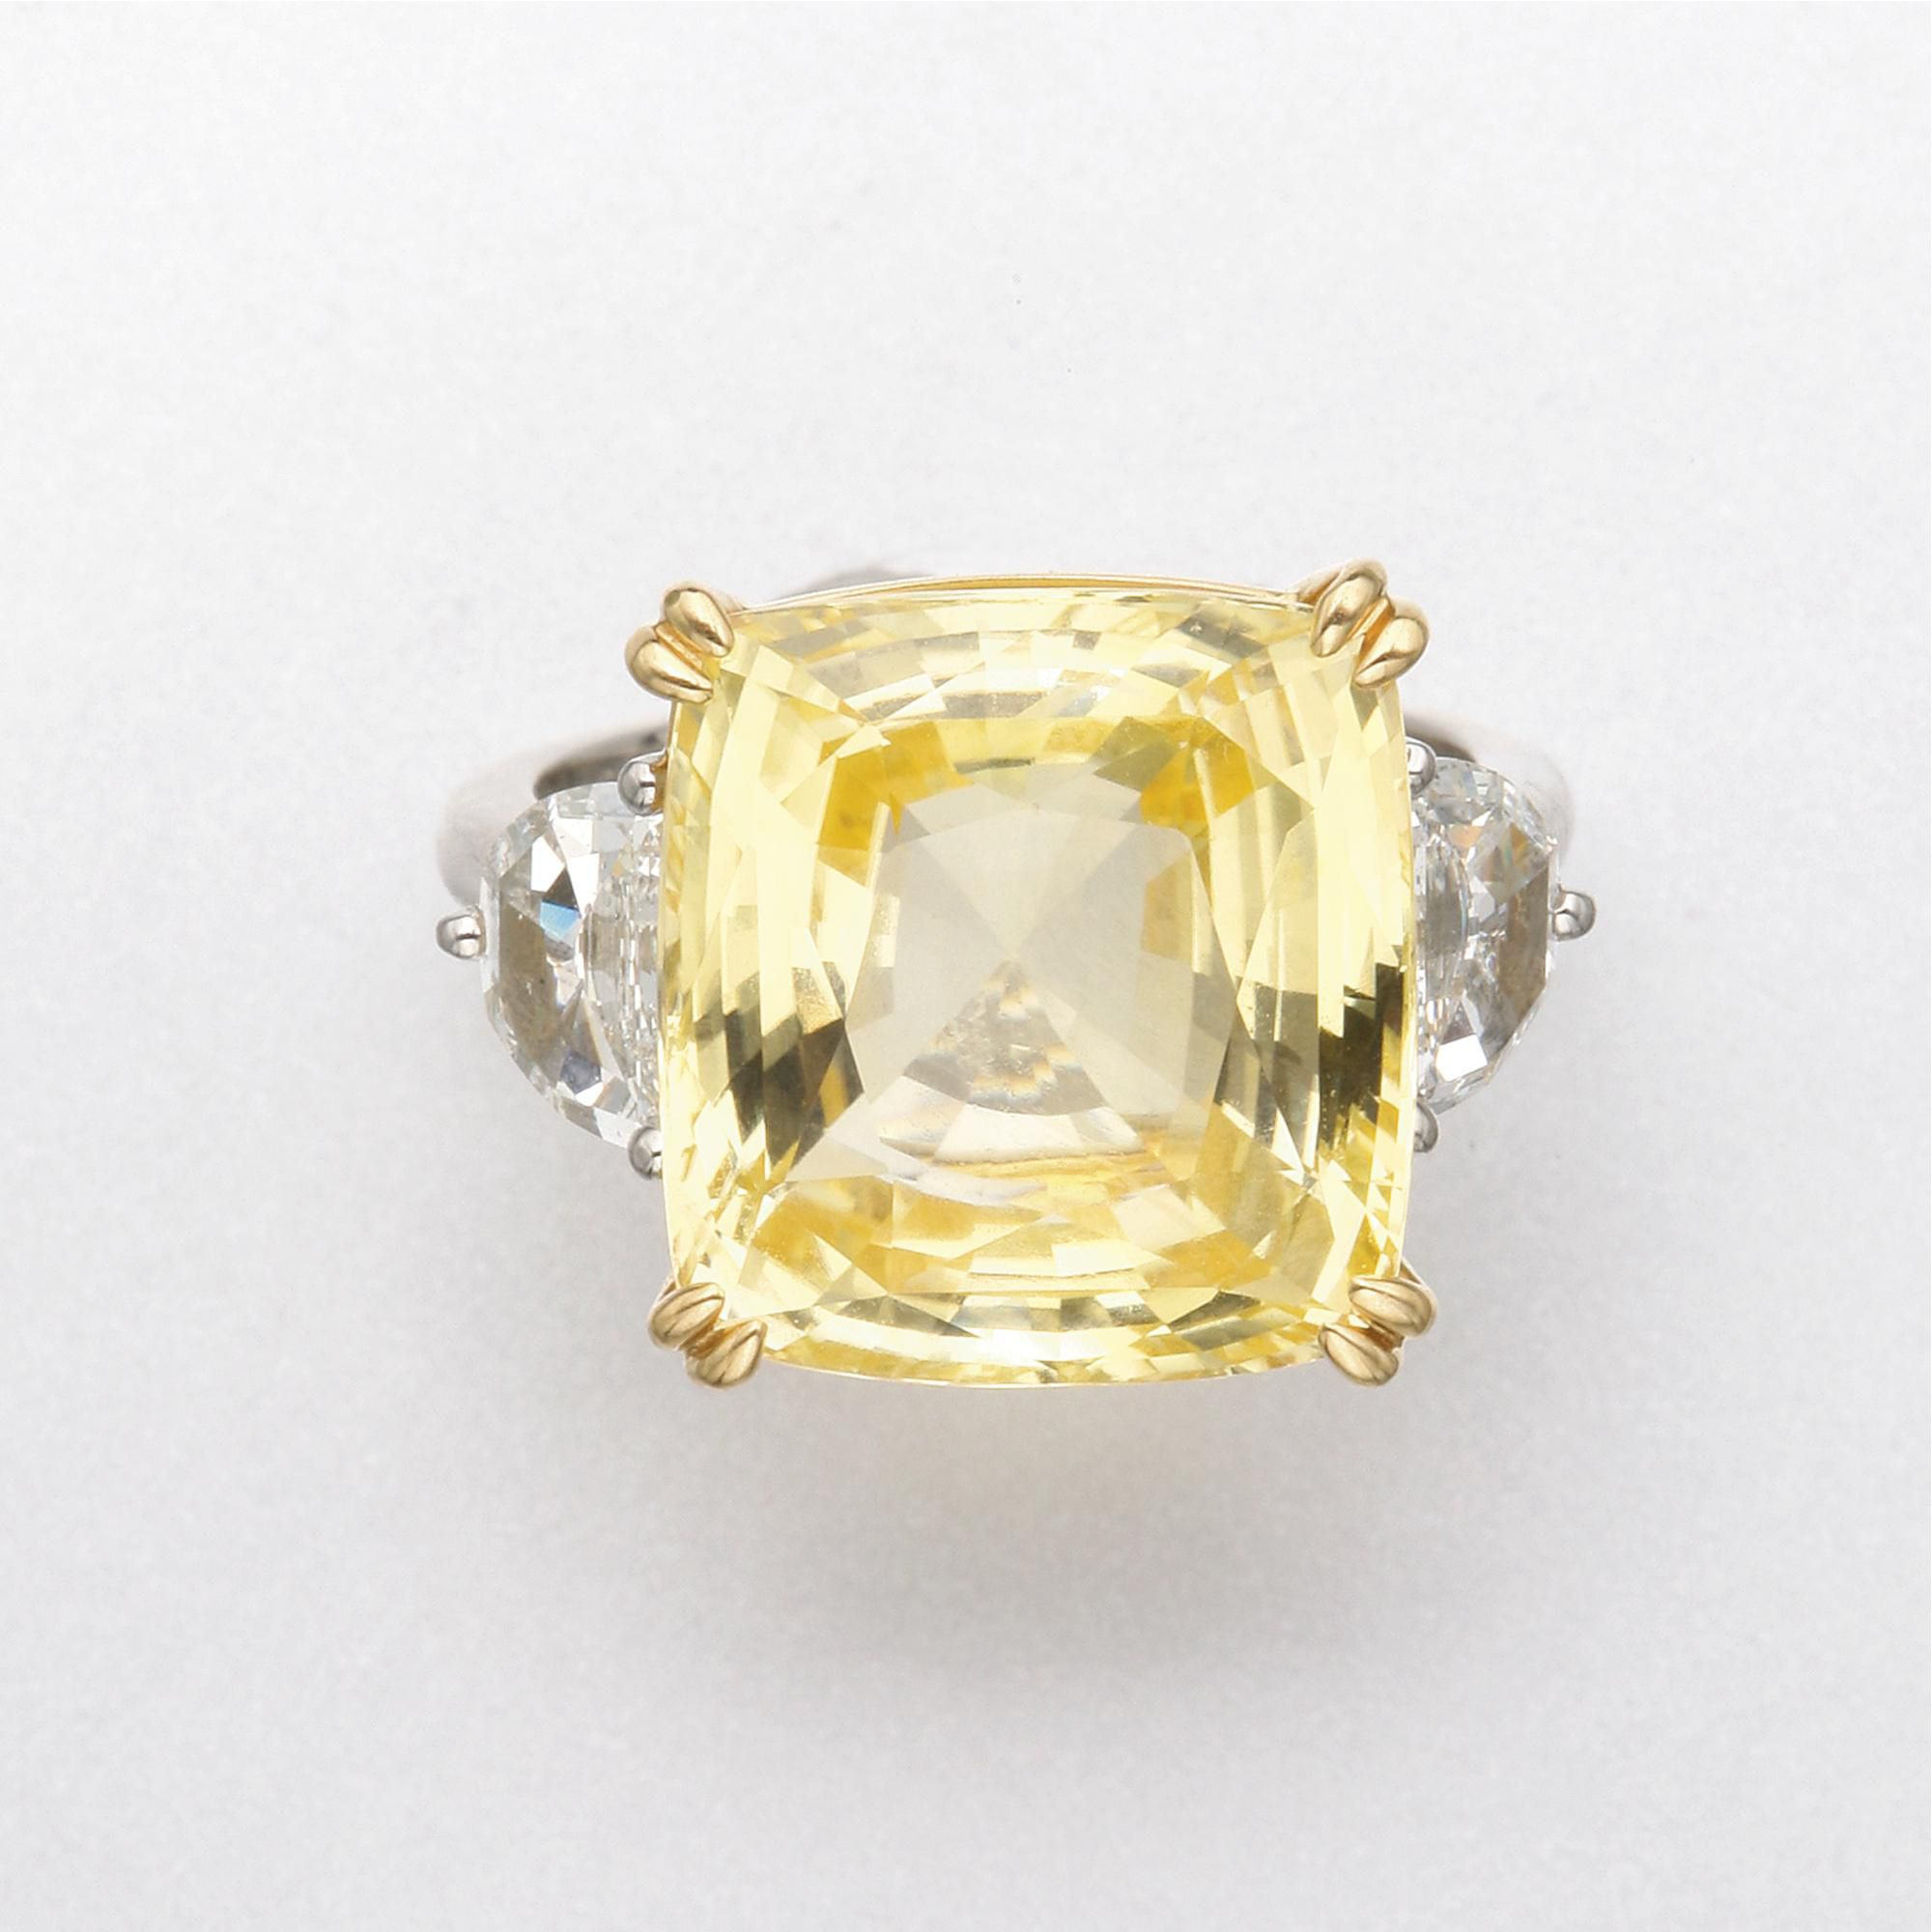 GOLD, YELLOW SAPPHIRE AND DIAMOND RING